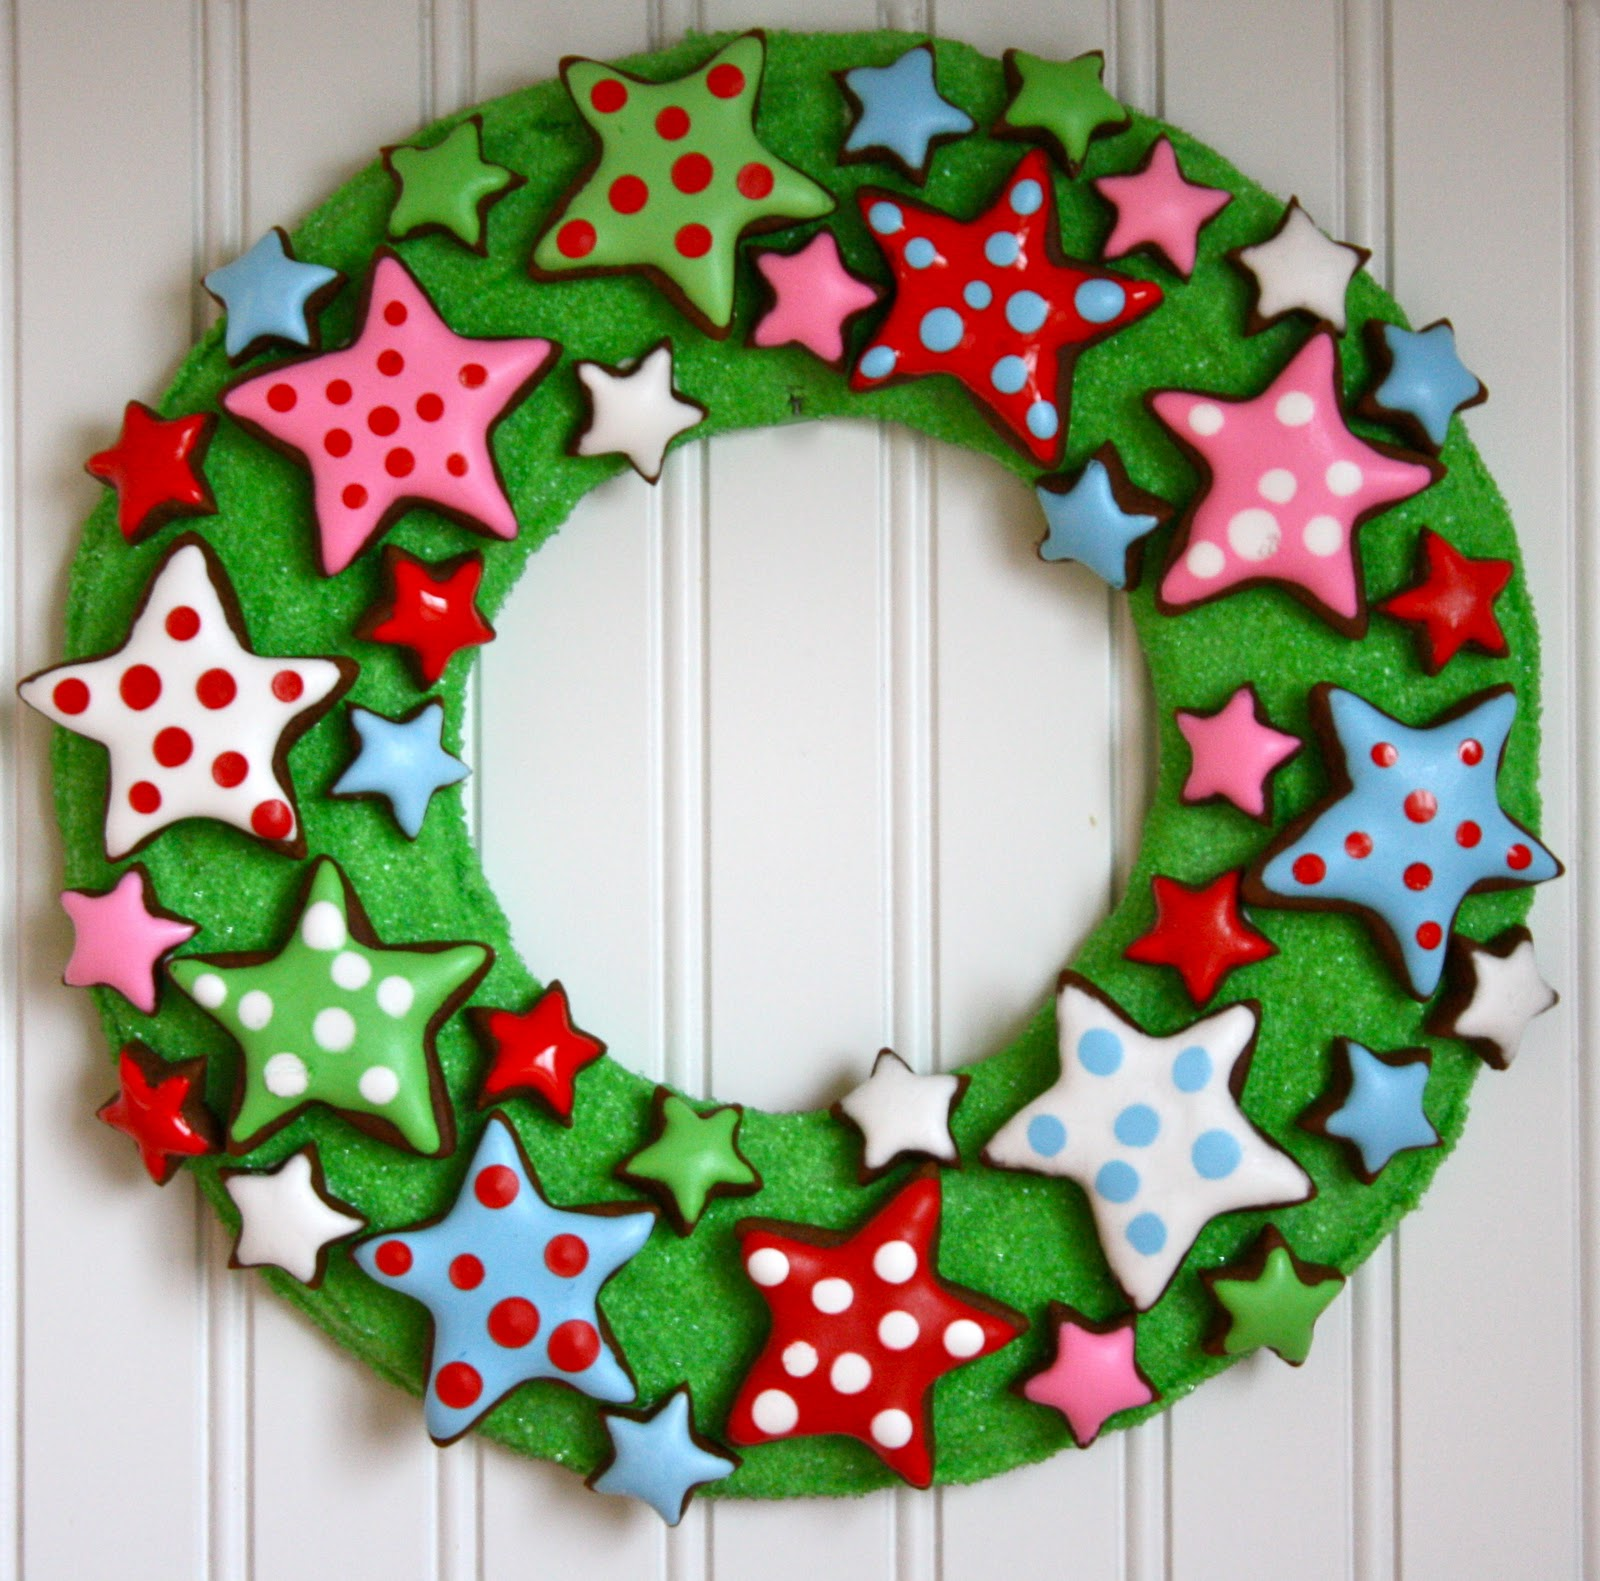 Cute Food For Kids?: 26 Edible Christmas Wreaths